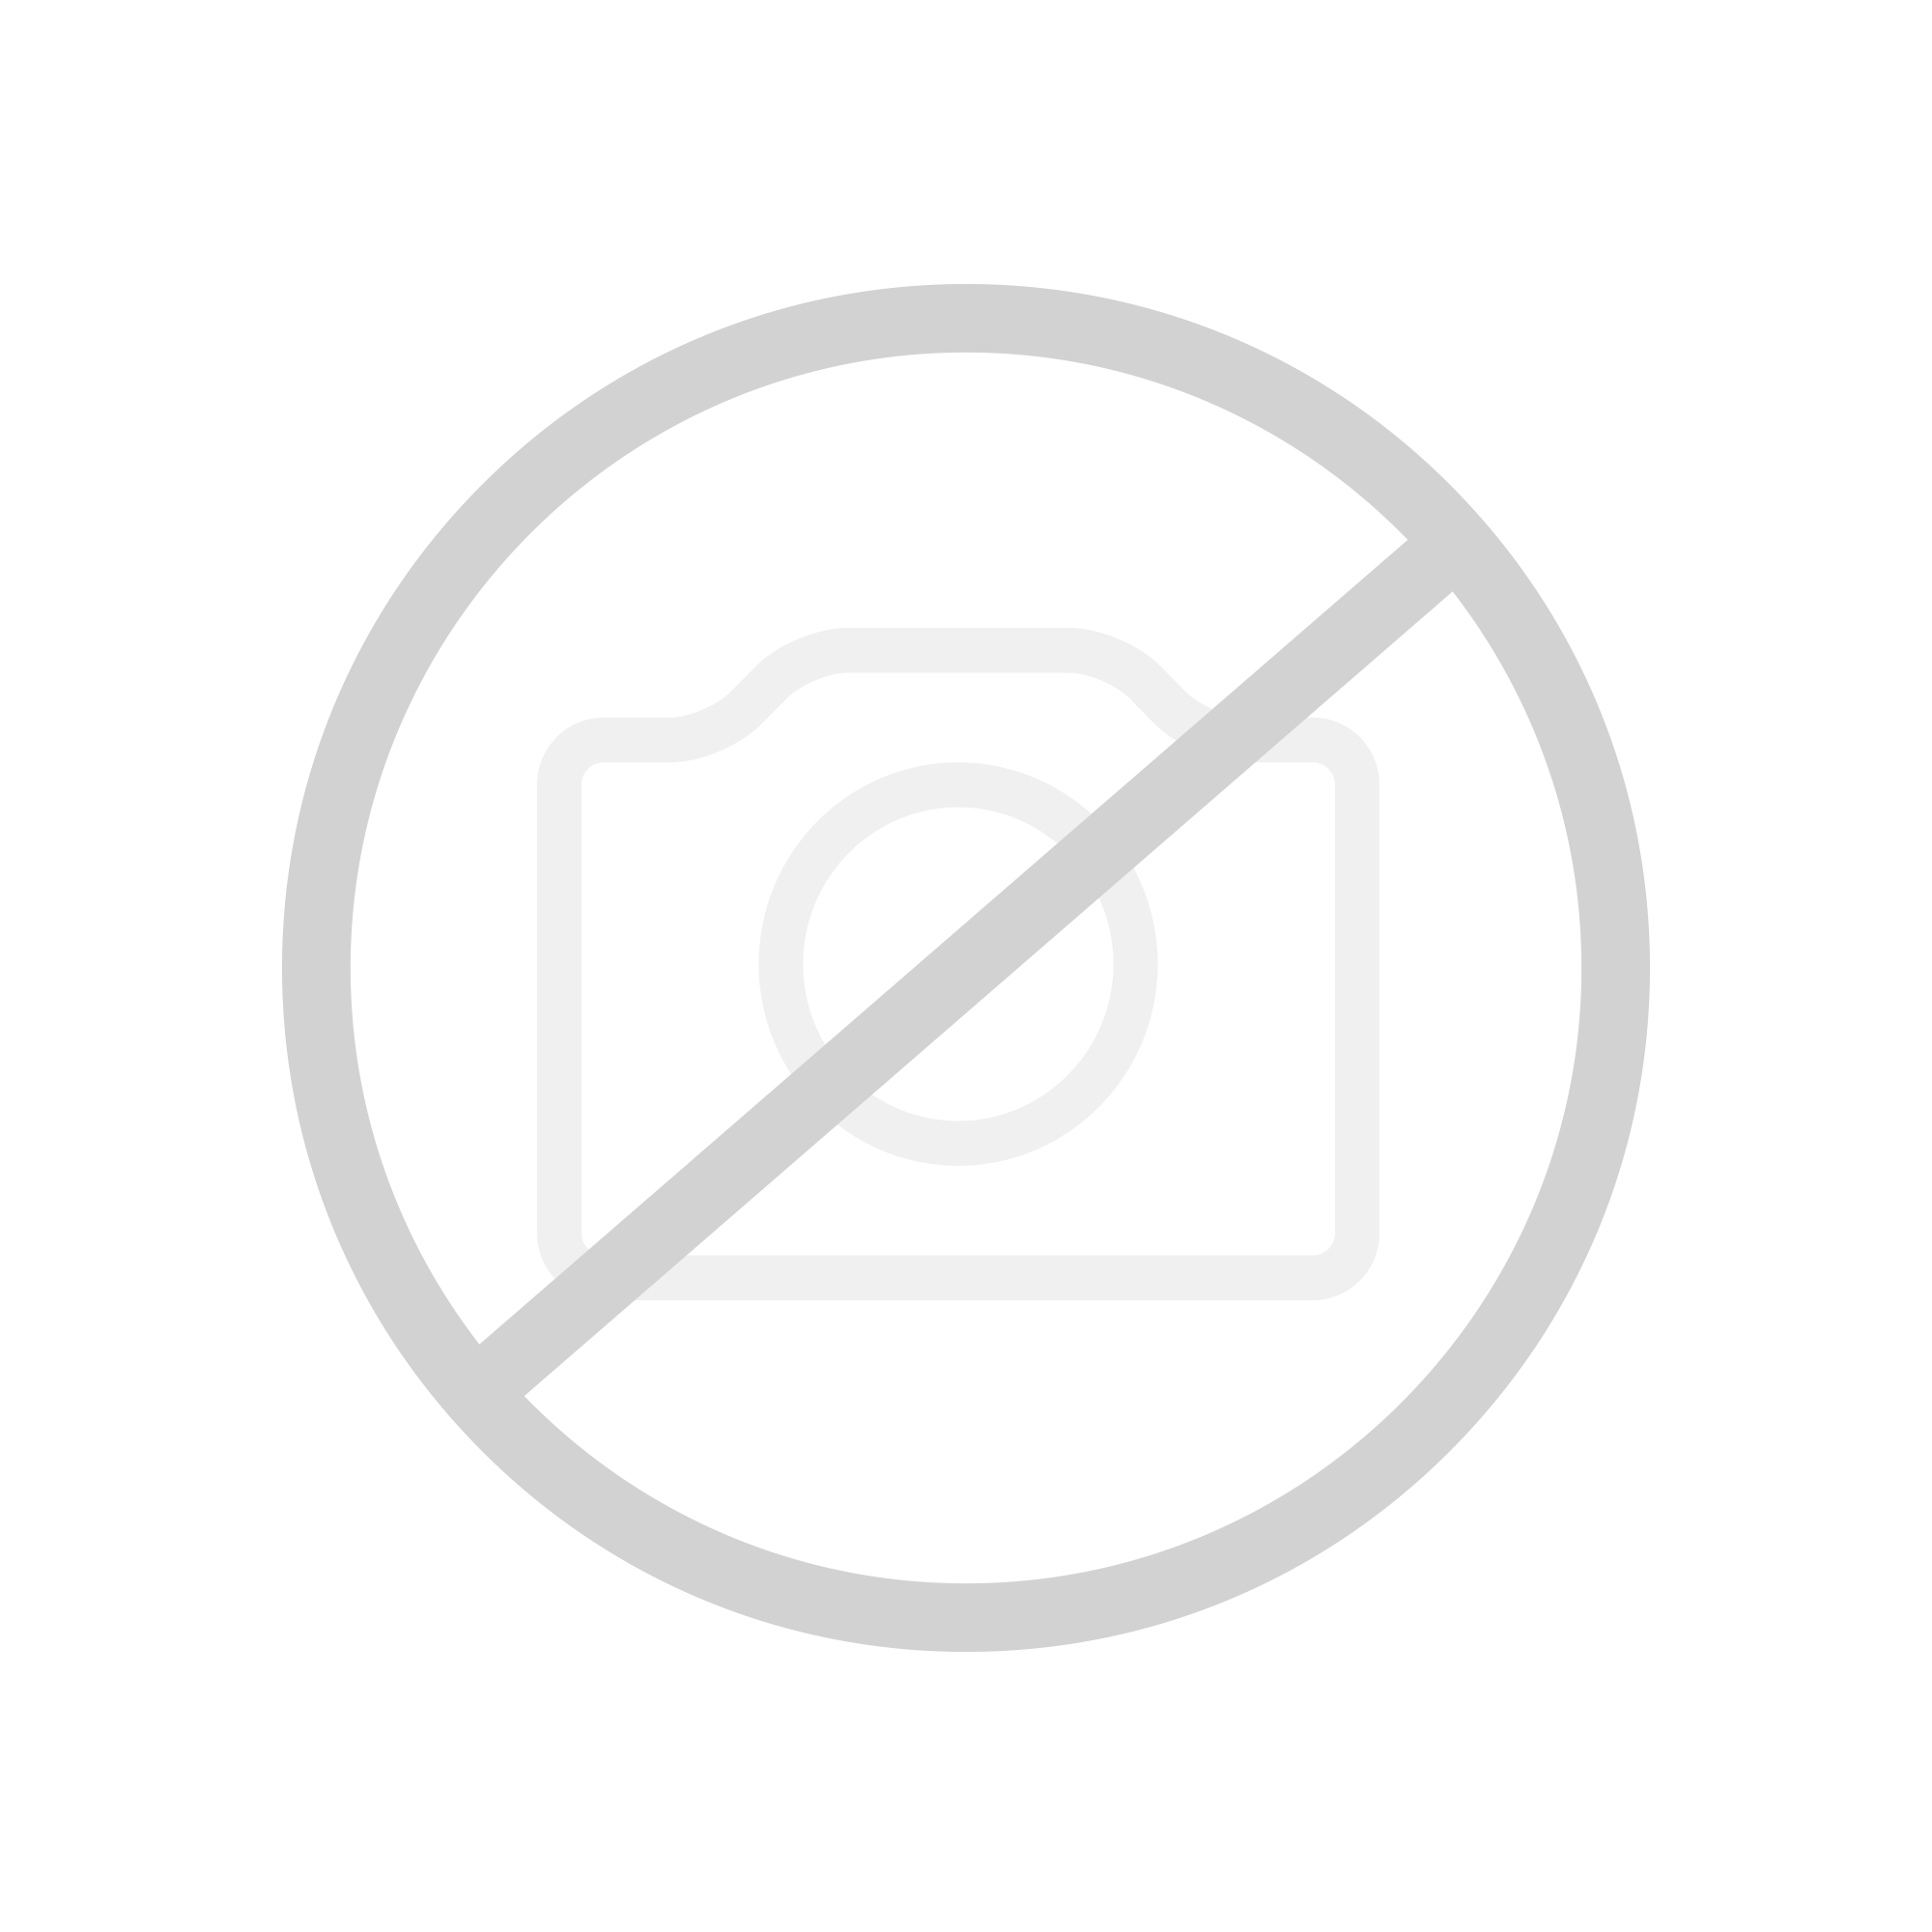 AXOR Starck Organic Thermostatmodul Unterputz Fertigset